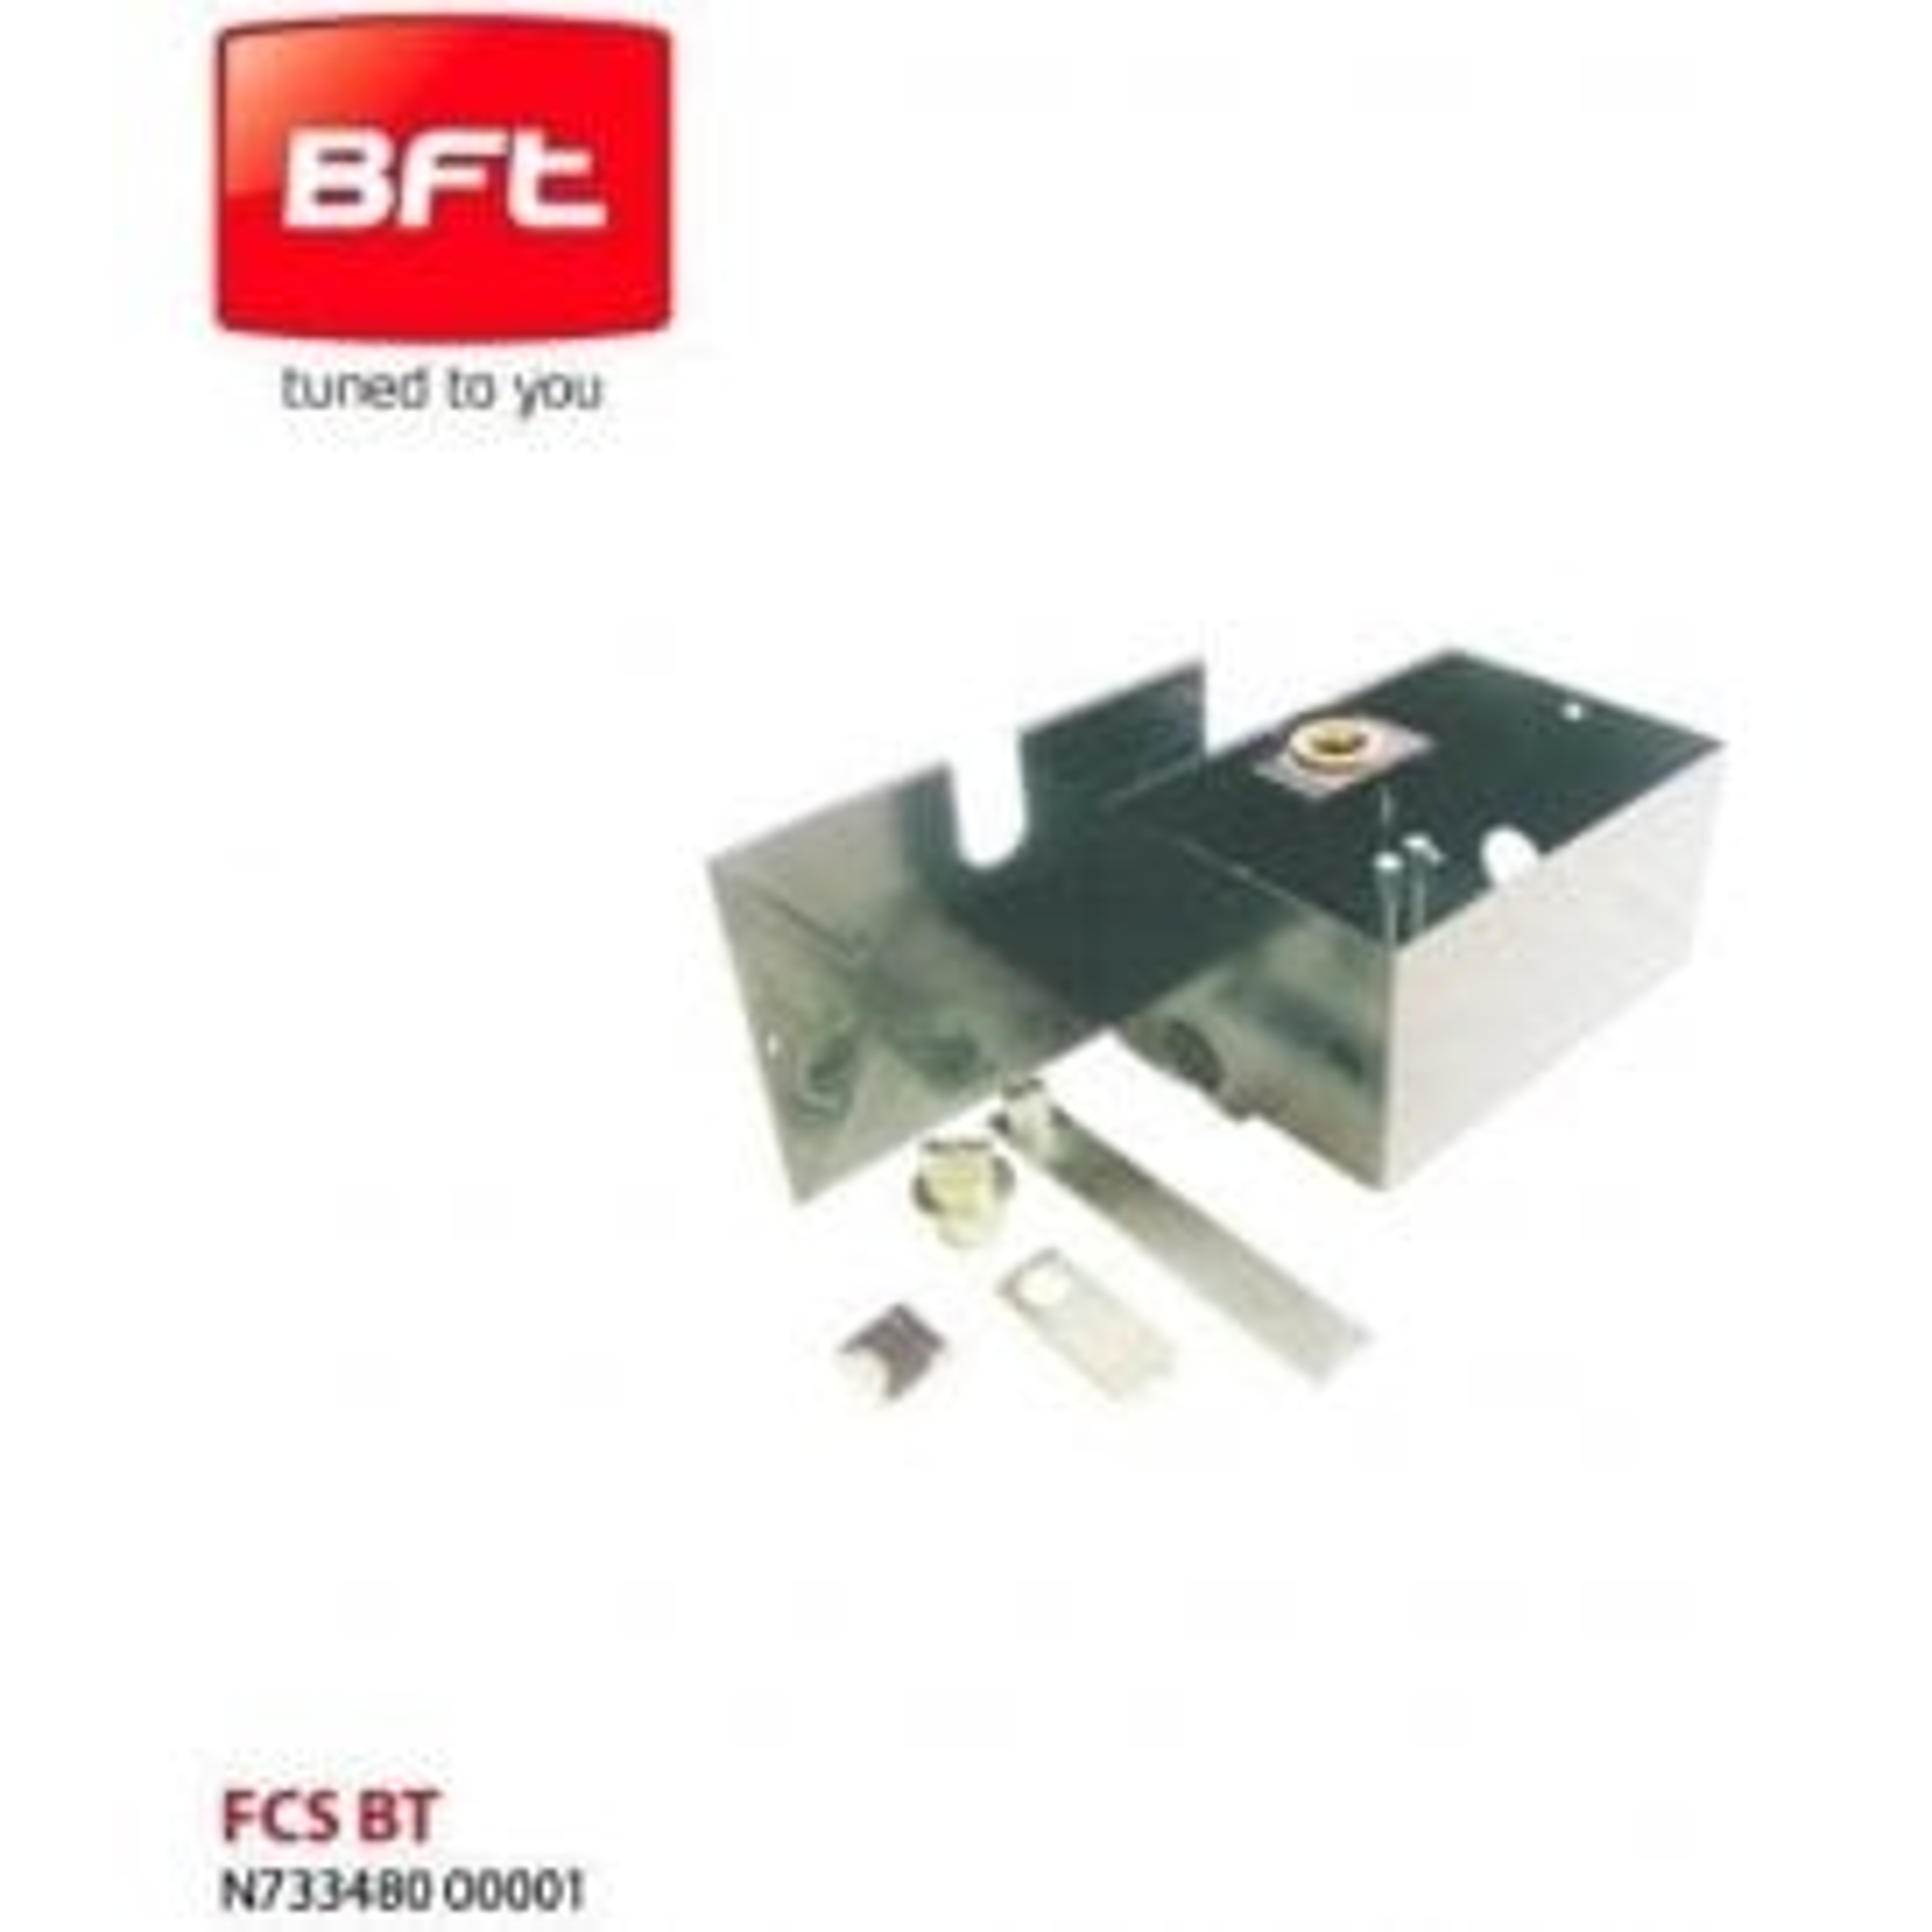 Foundation box for sub